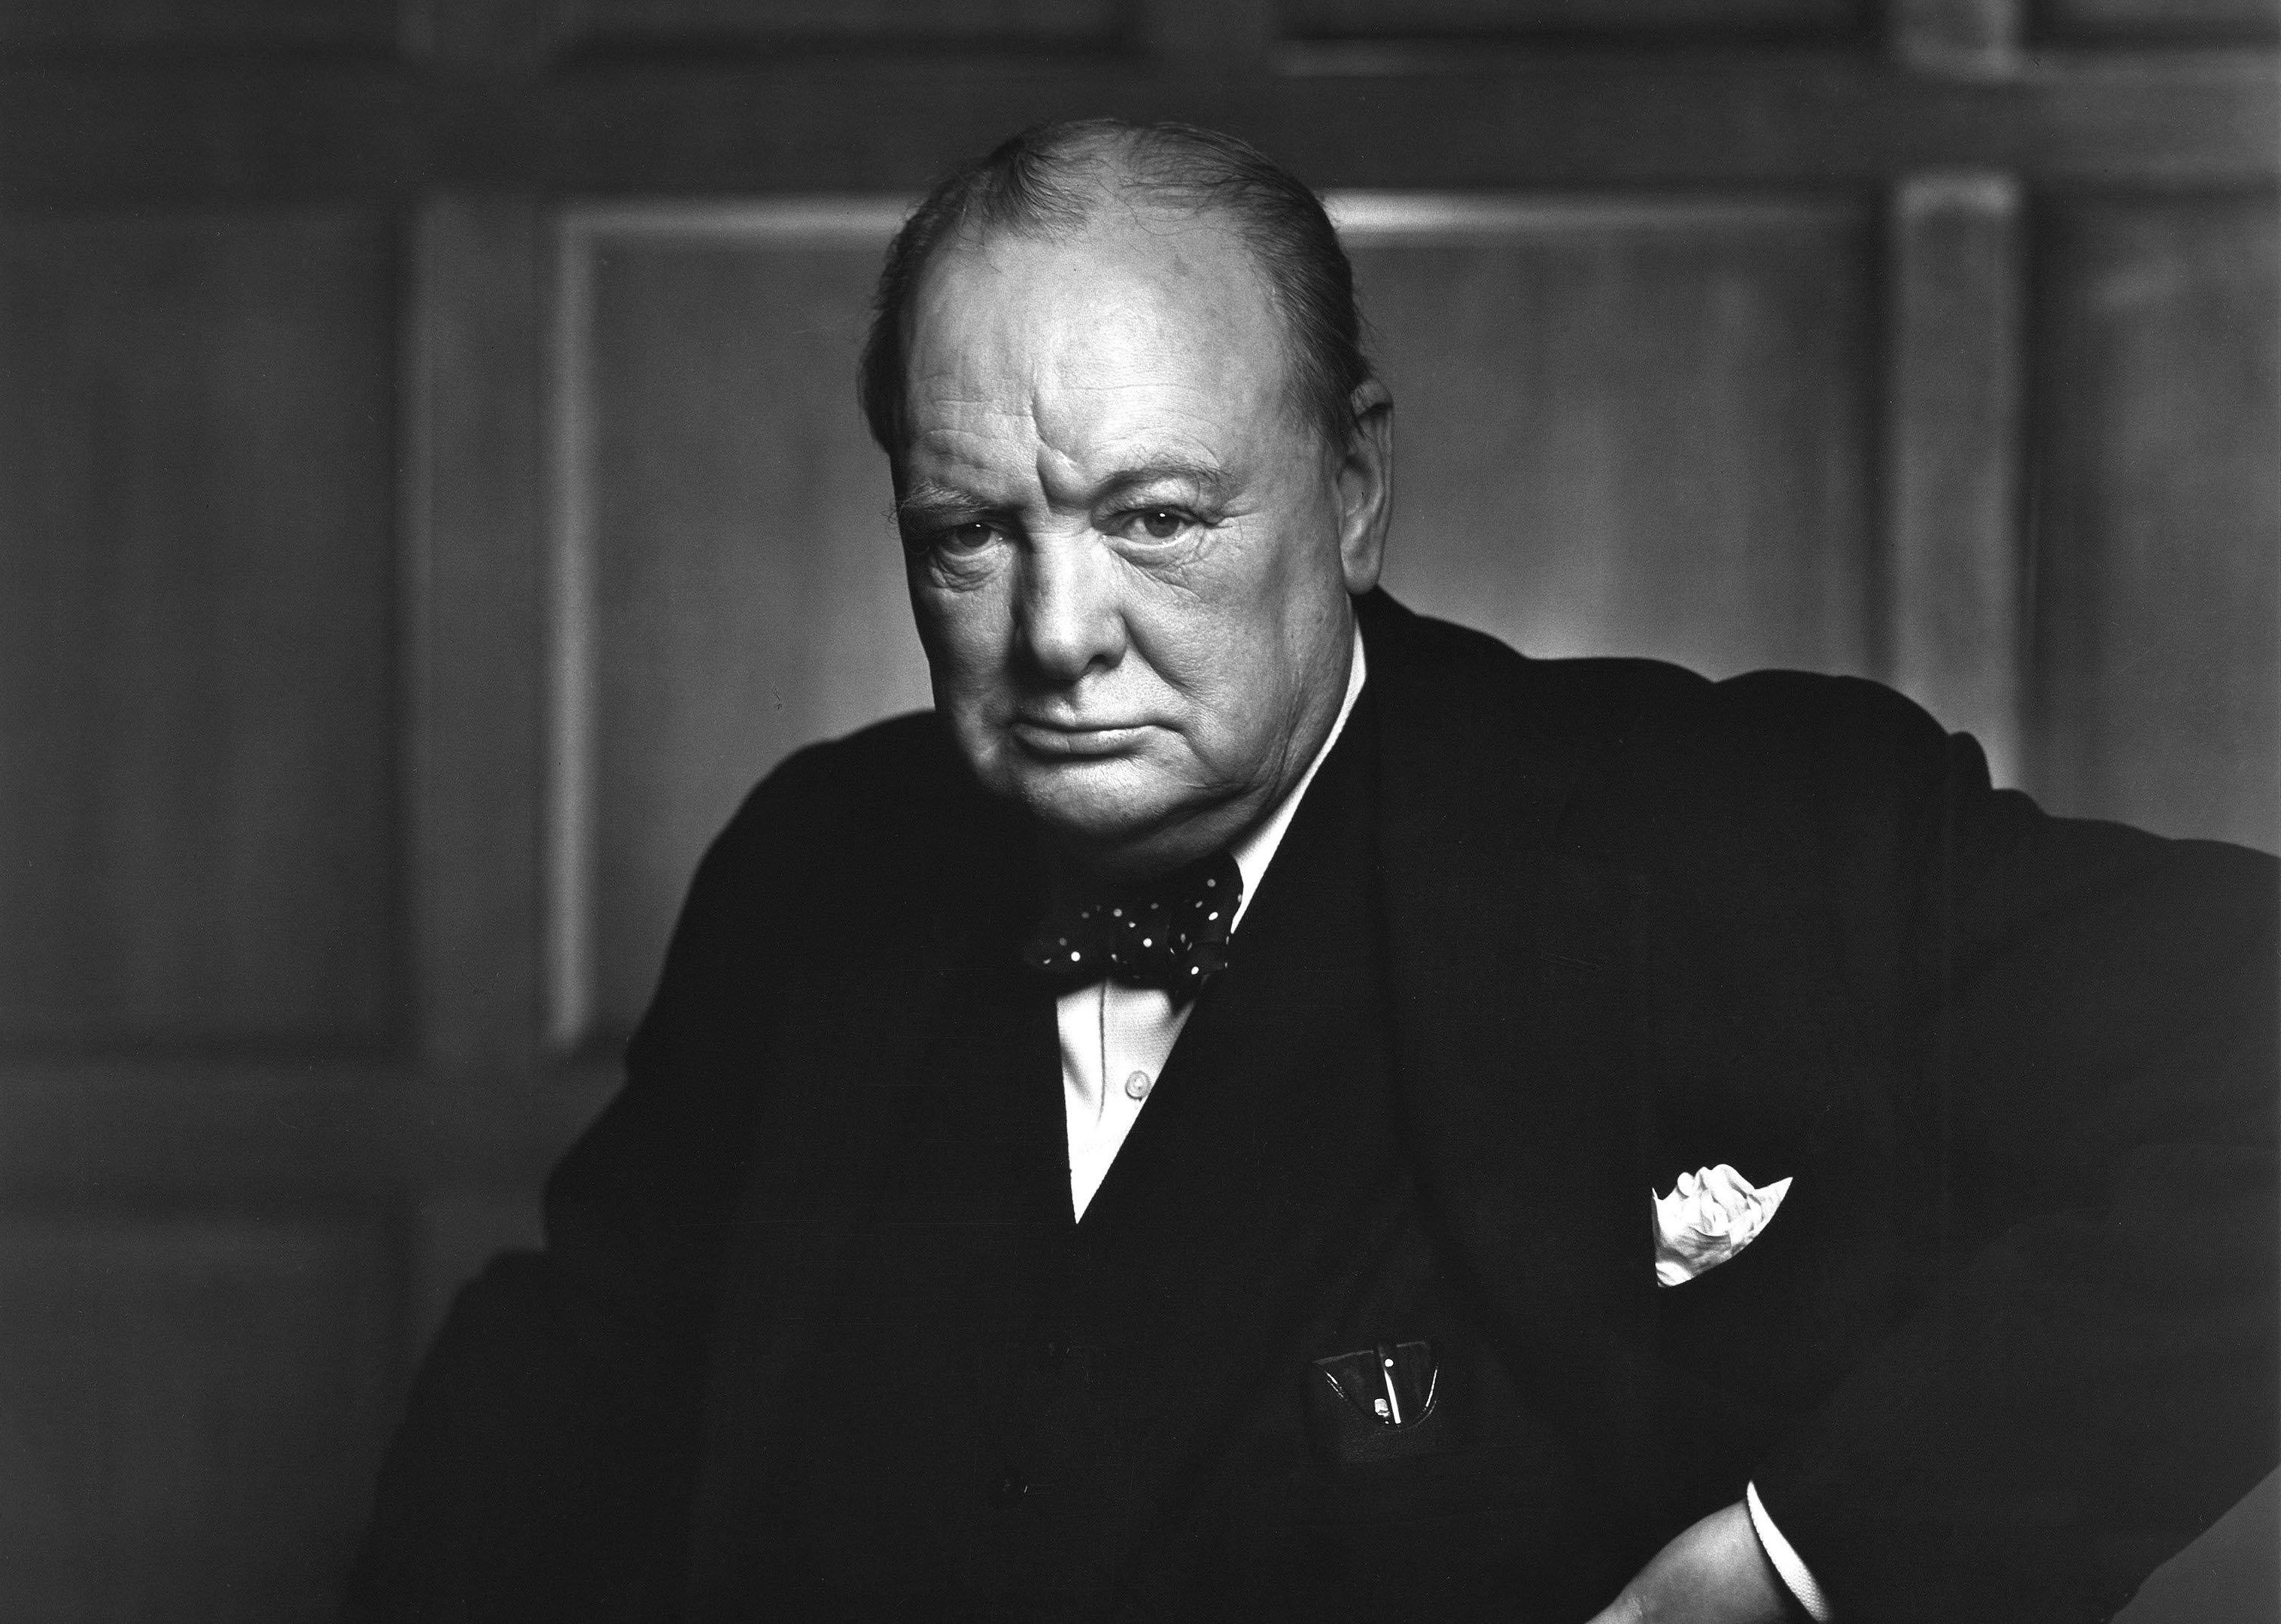 Sir_Winston_Churchill_-_19086236948.jpg